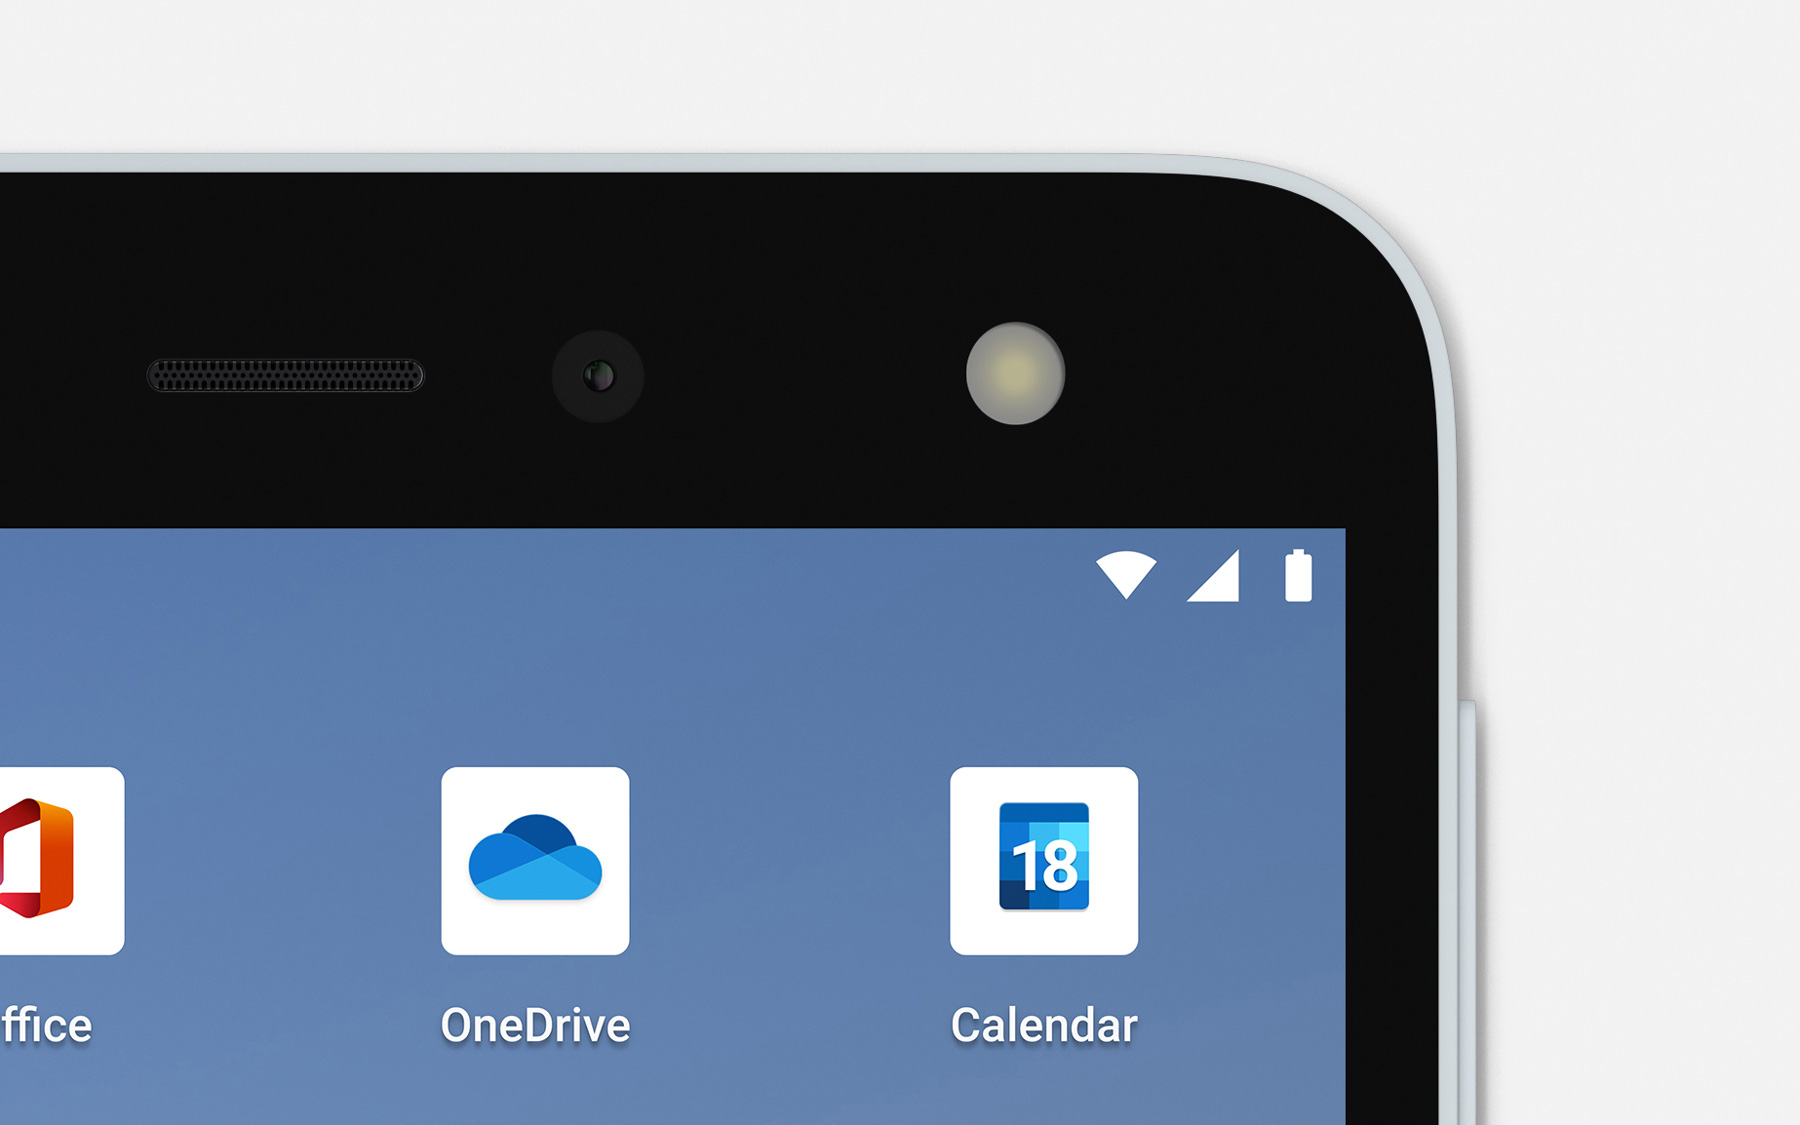 Microsoft Surface Duo vs. Samsung Galaxy Z Fold 2